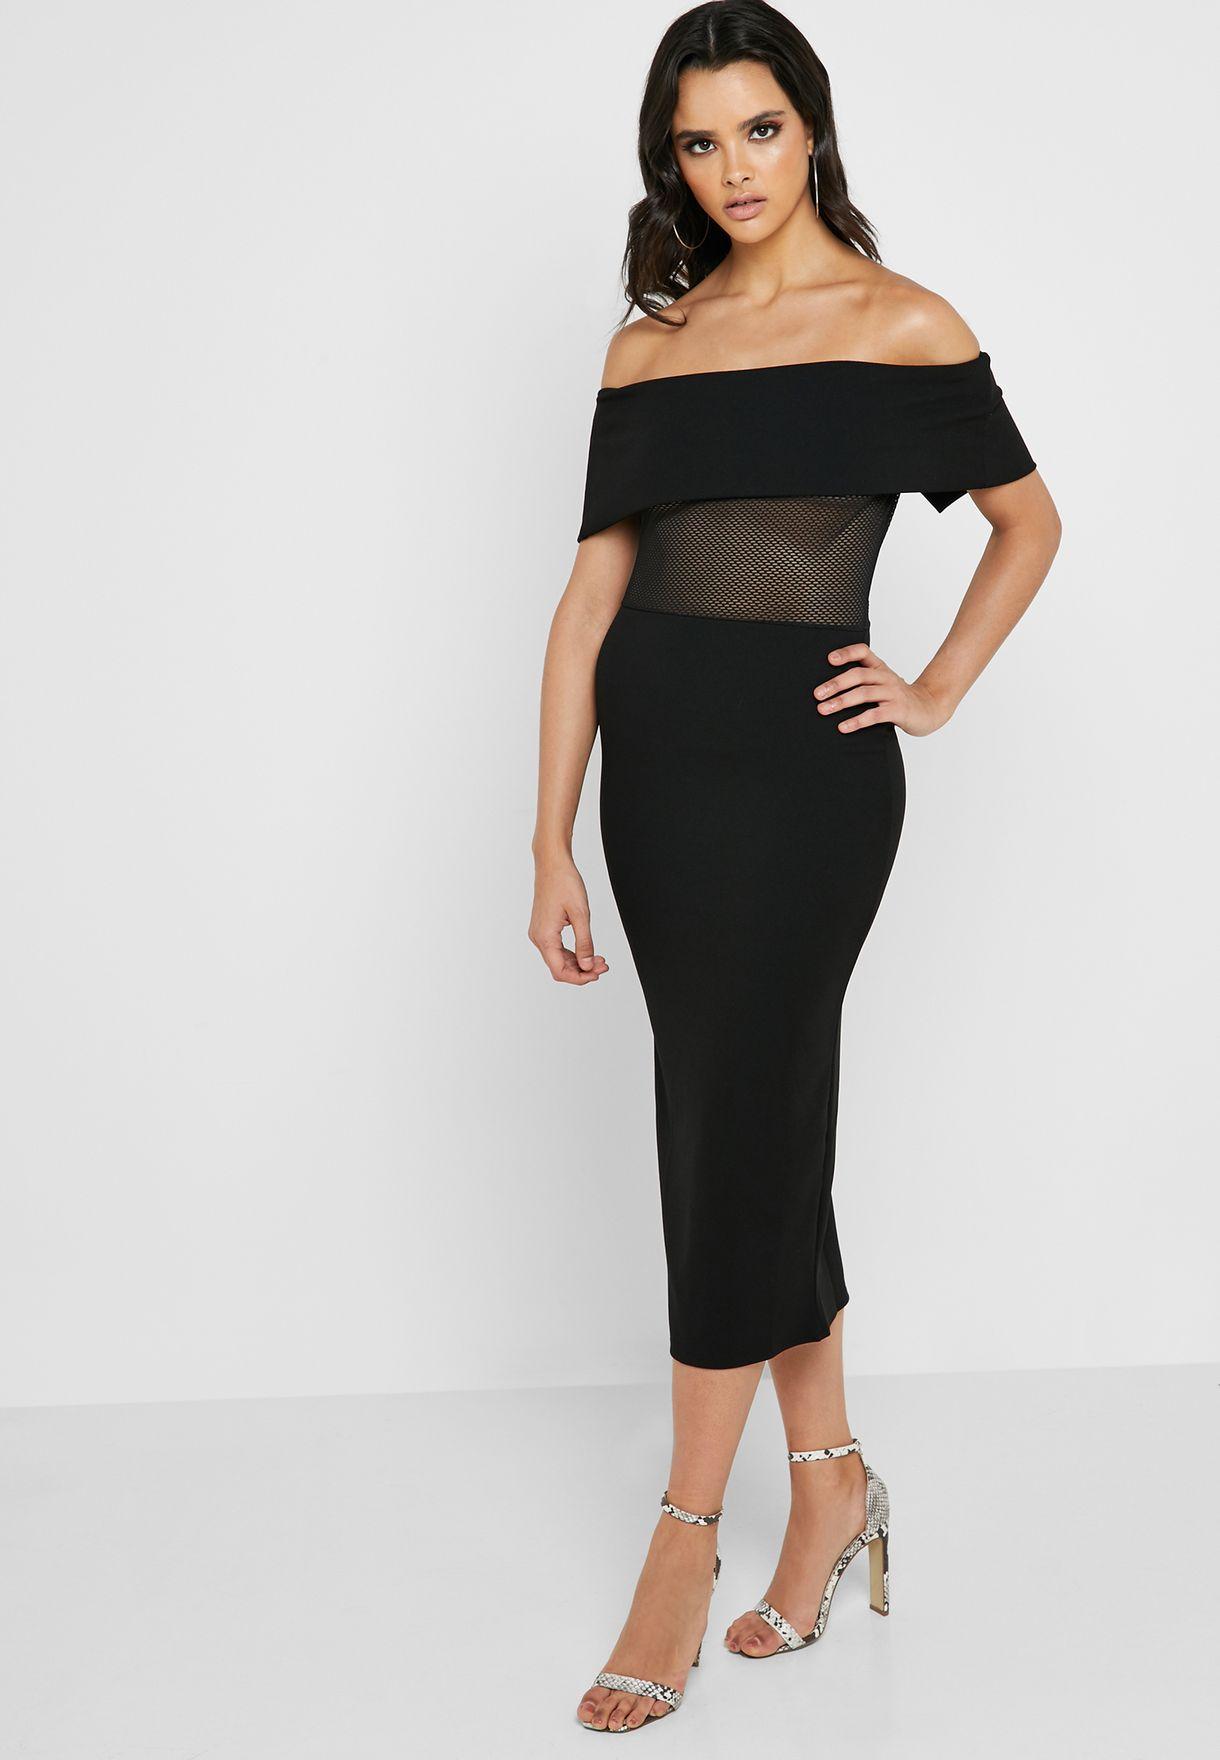 9b34f76716 Shop Missguided black Bardot Fishnet Bodycon Dress DE928354 for ...